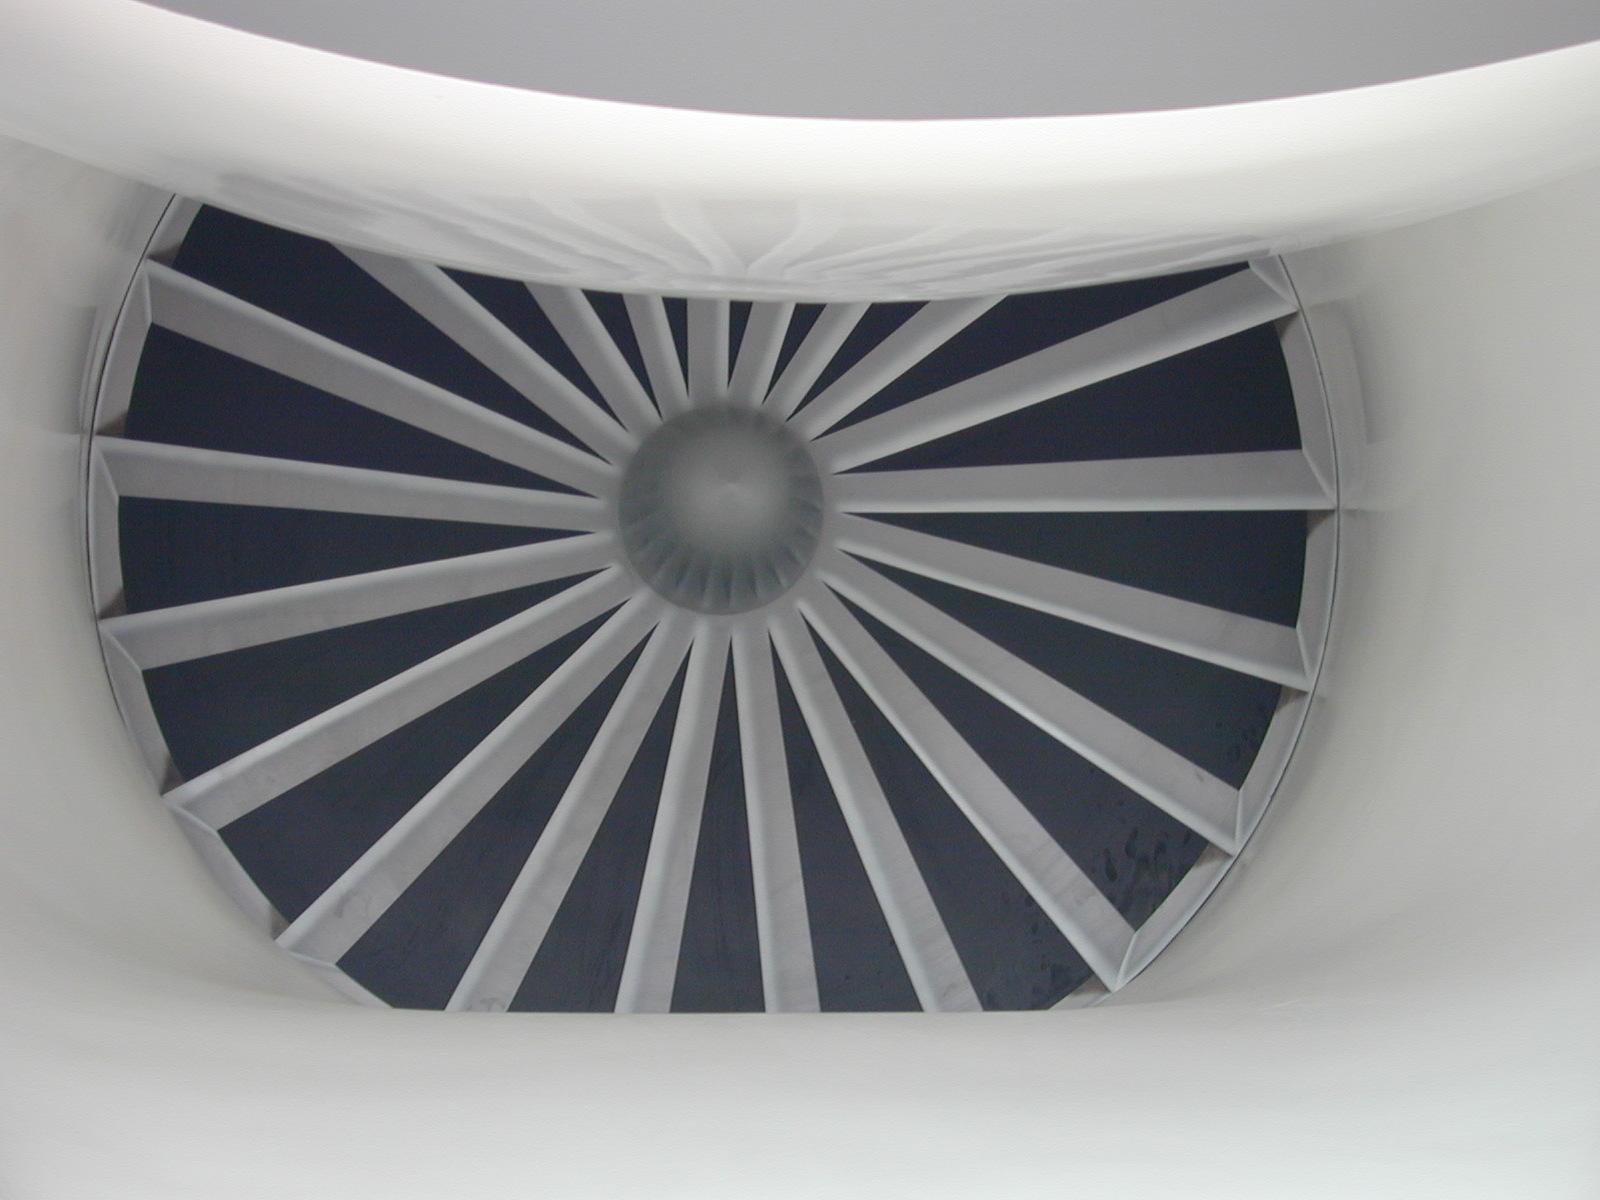 engine turbine inlet industry turbo jetengine blade blades